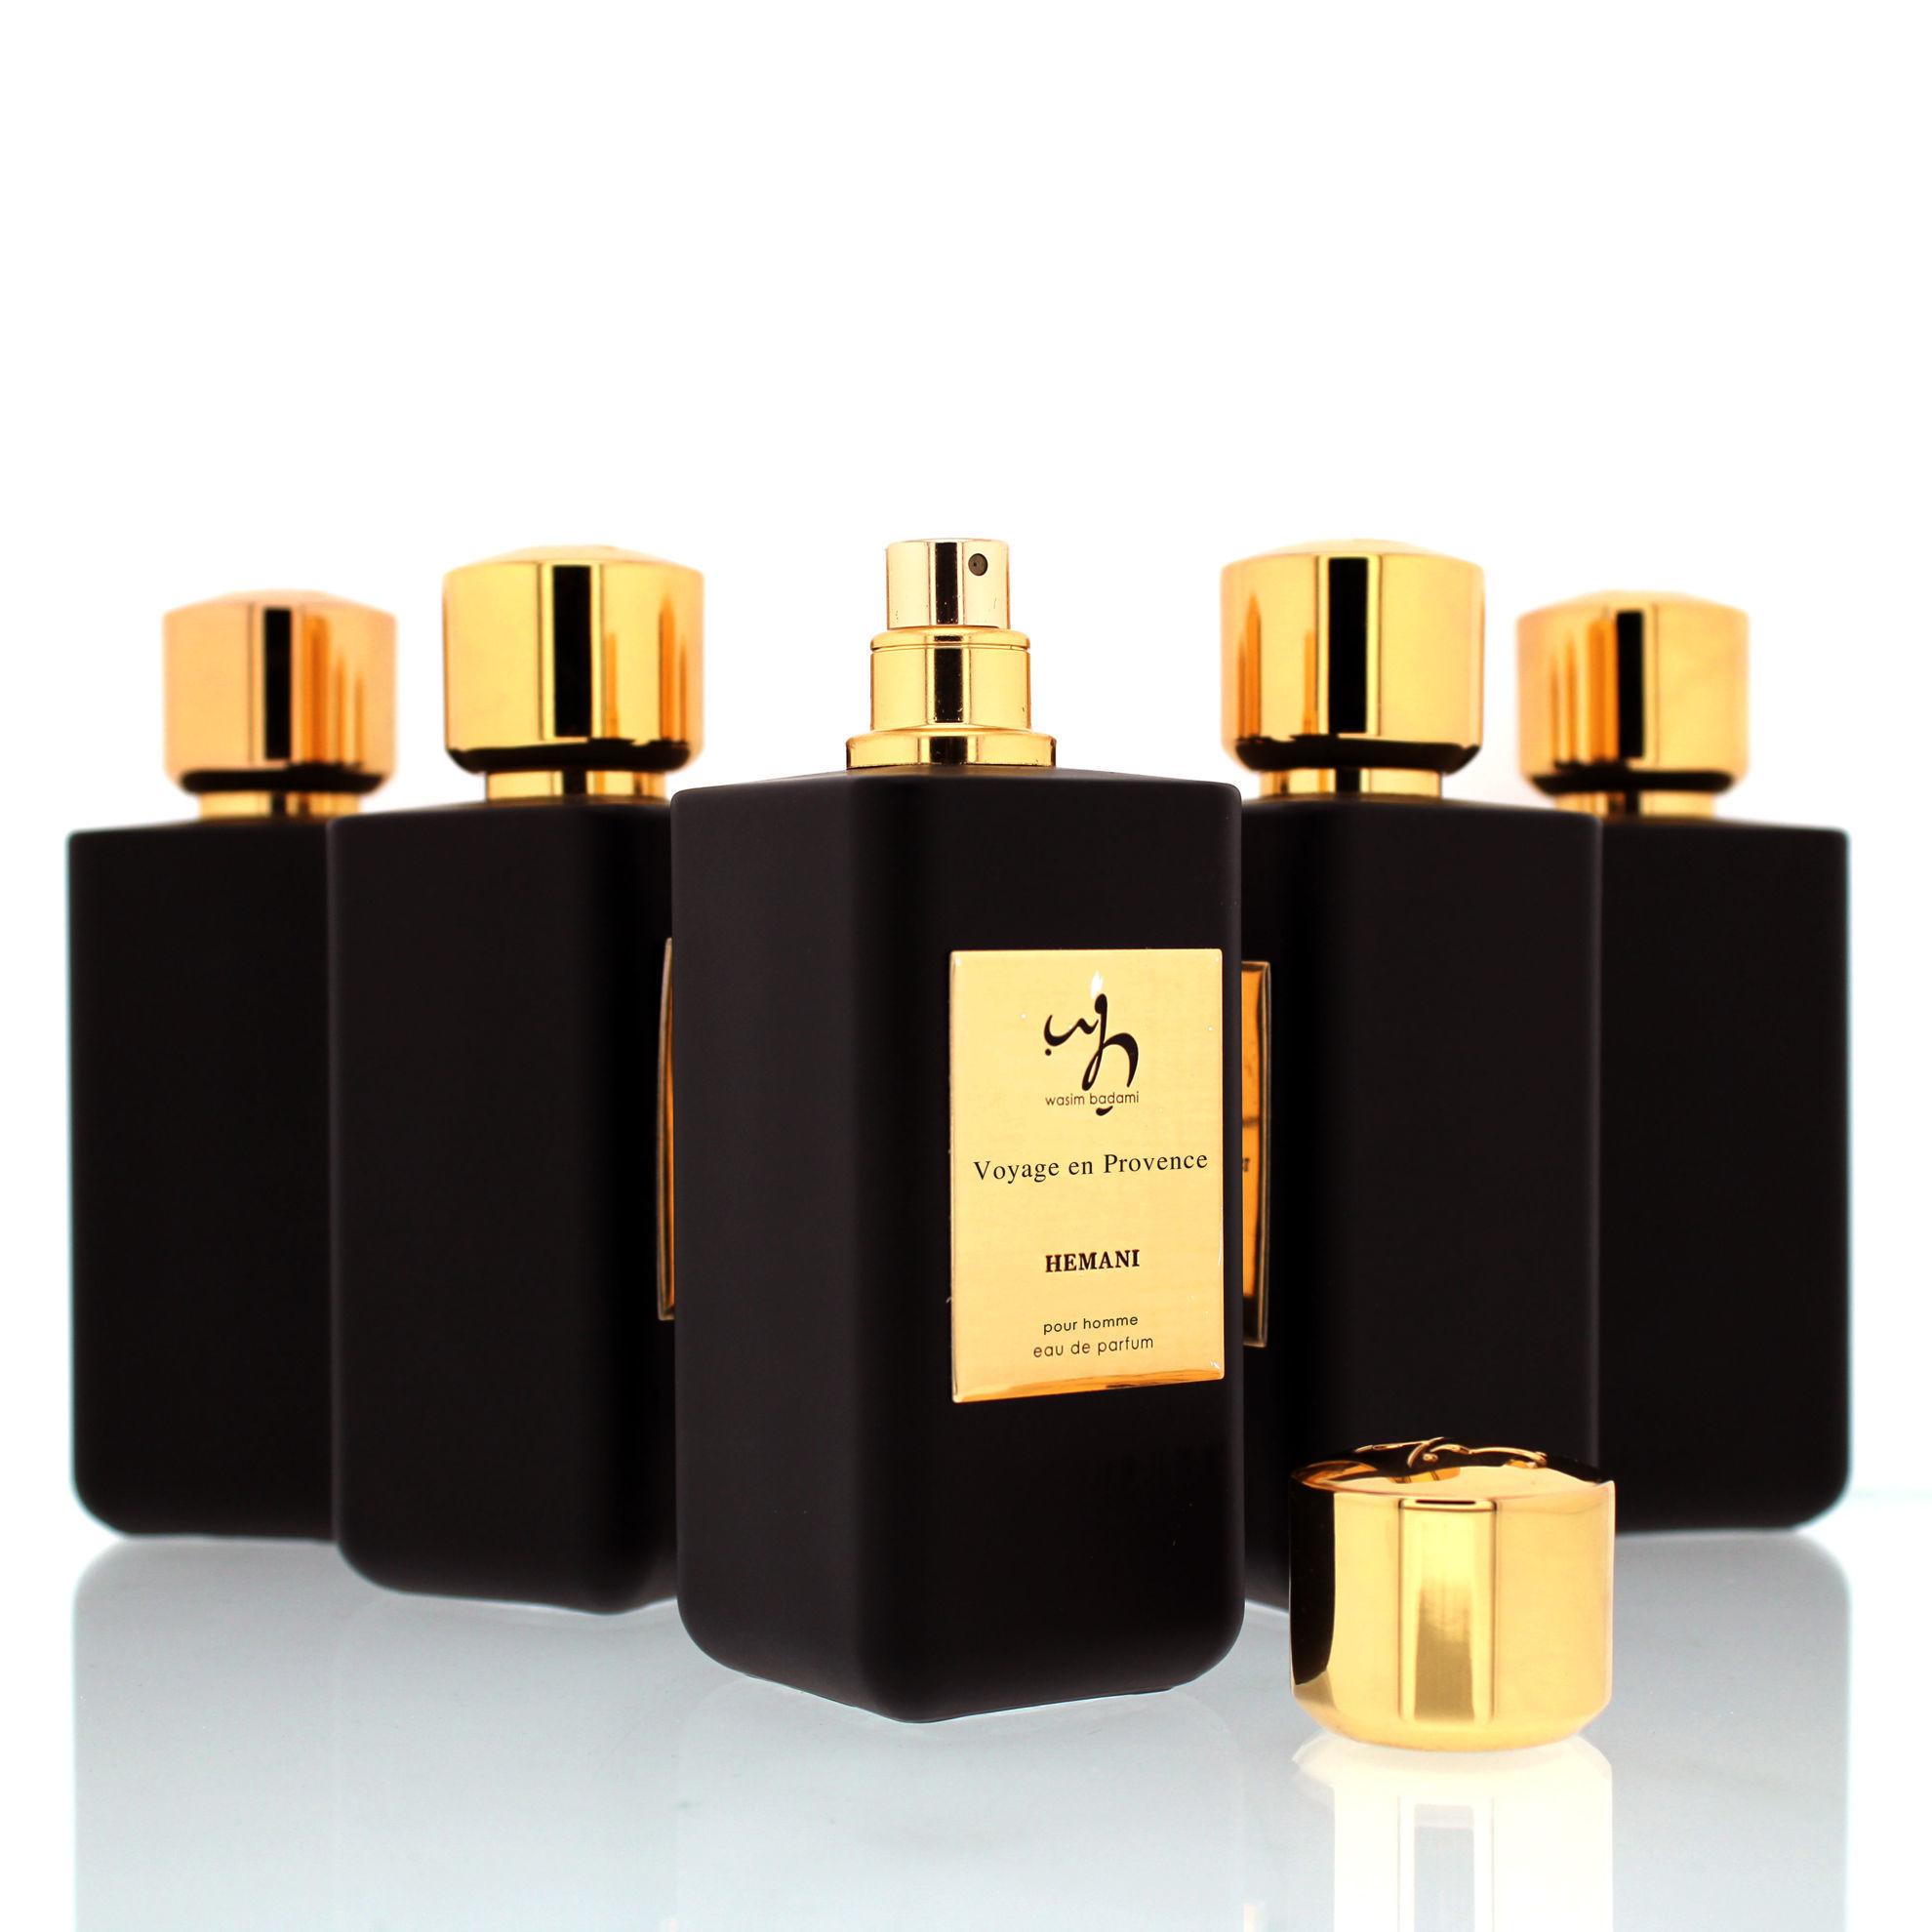 Voyage en Provence Perfume For Men premium fragrance collection